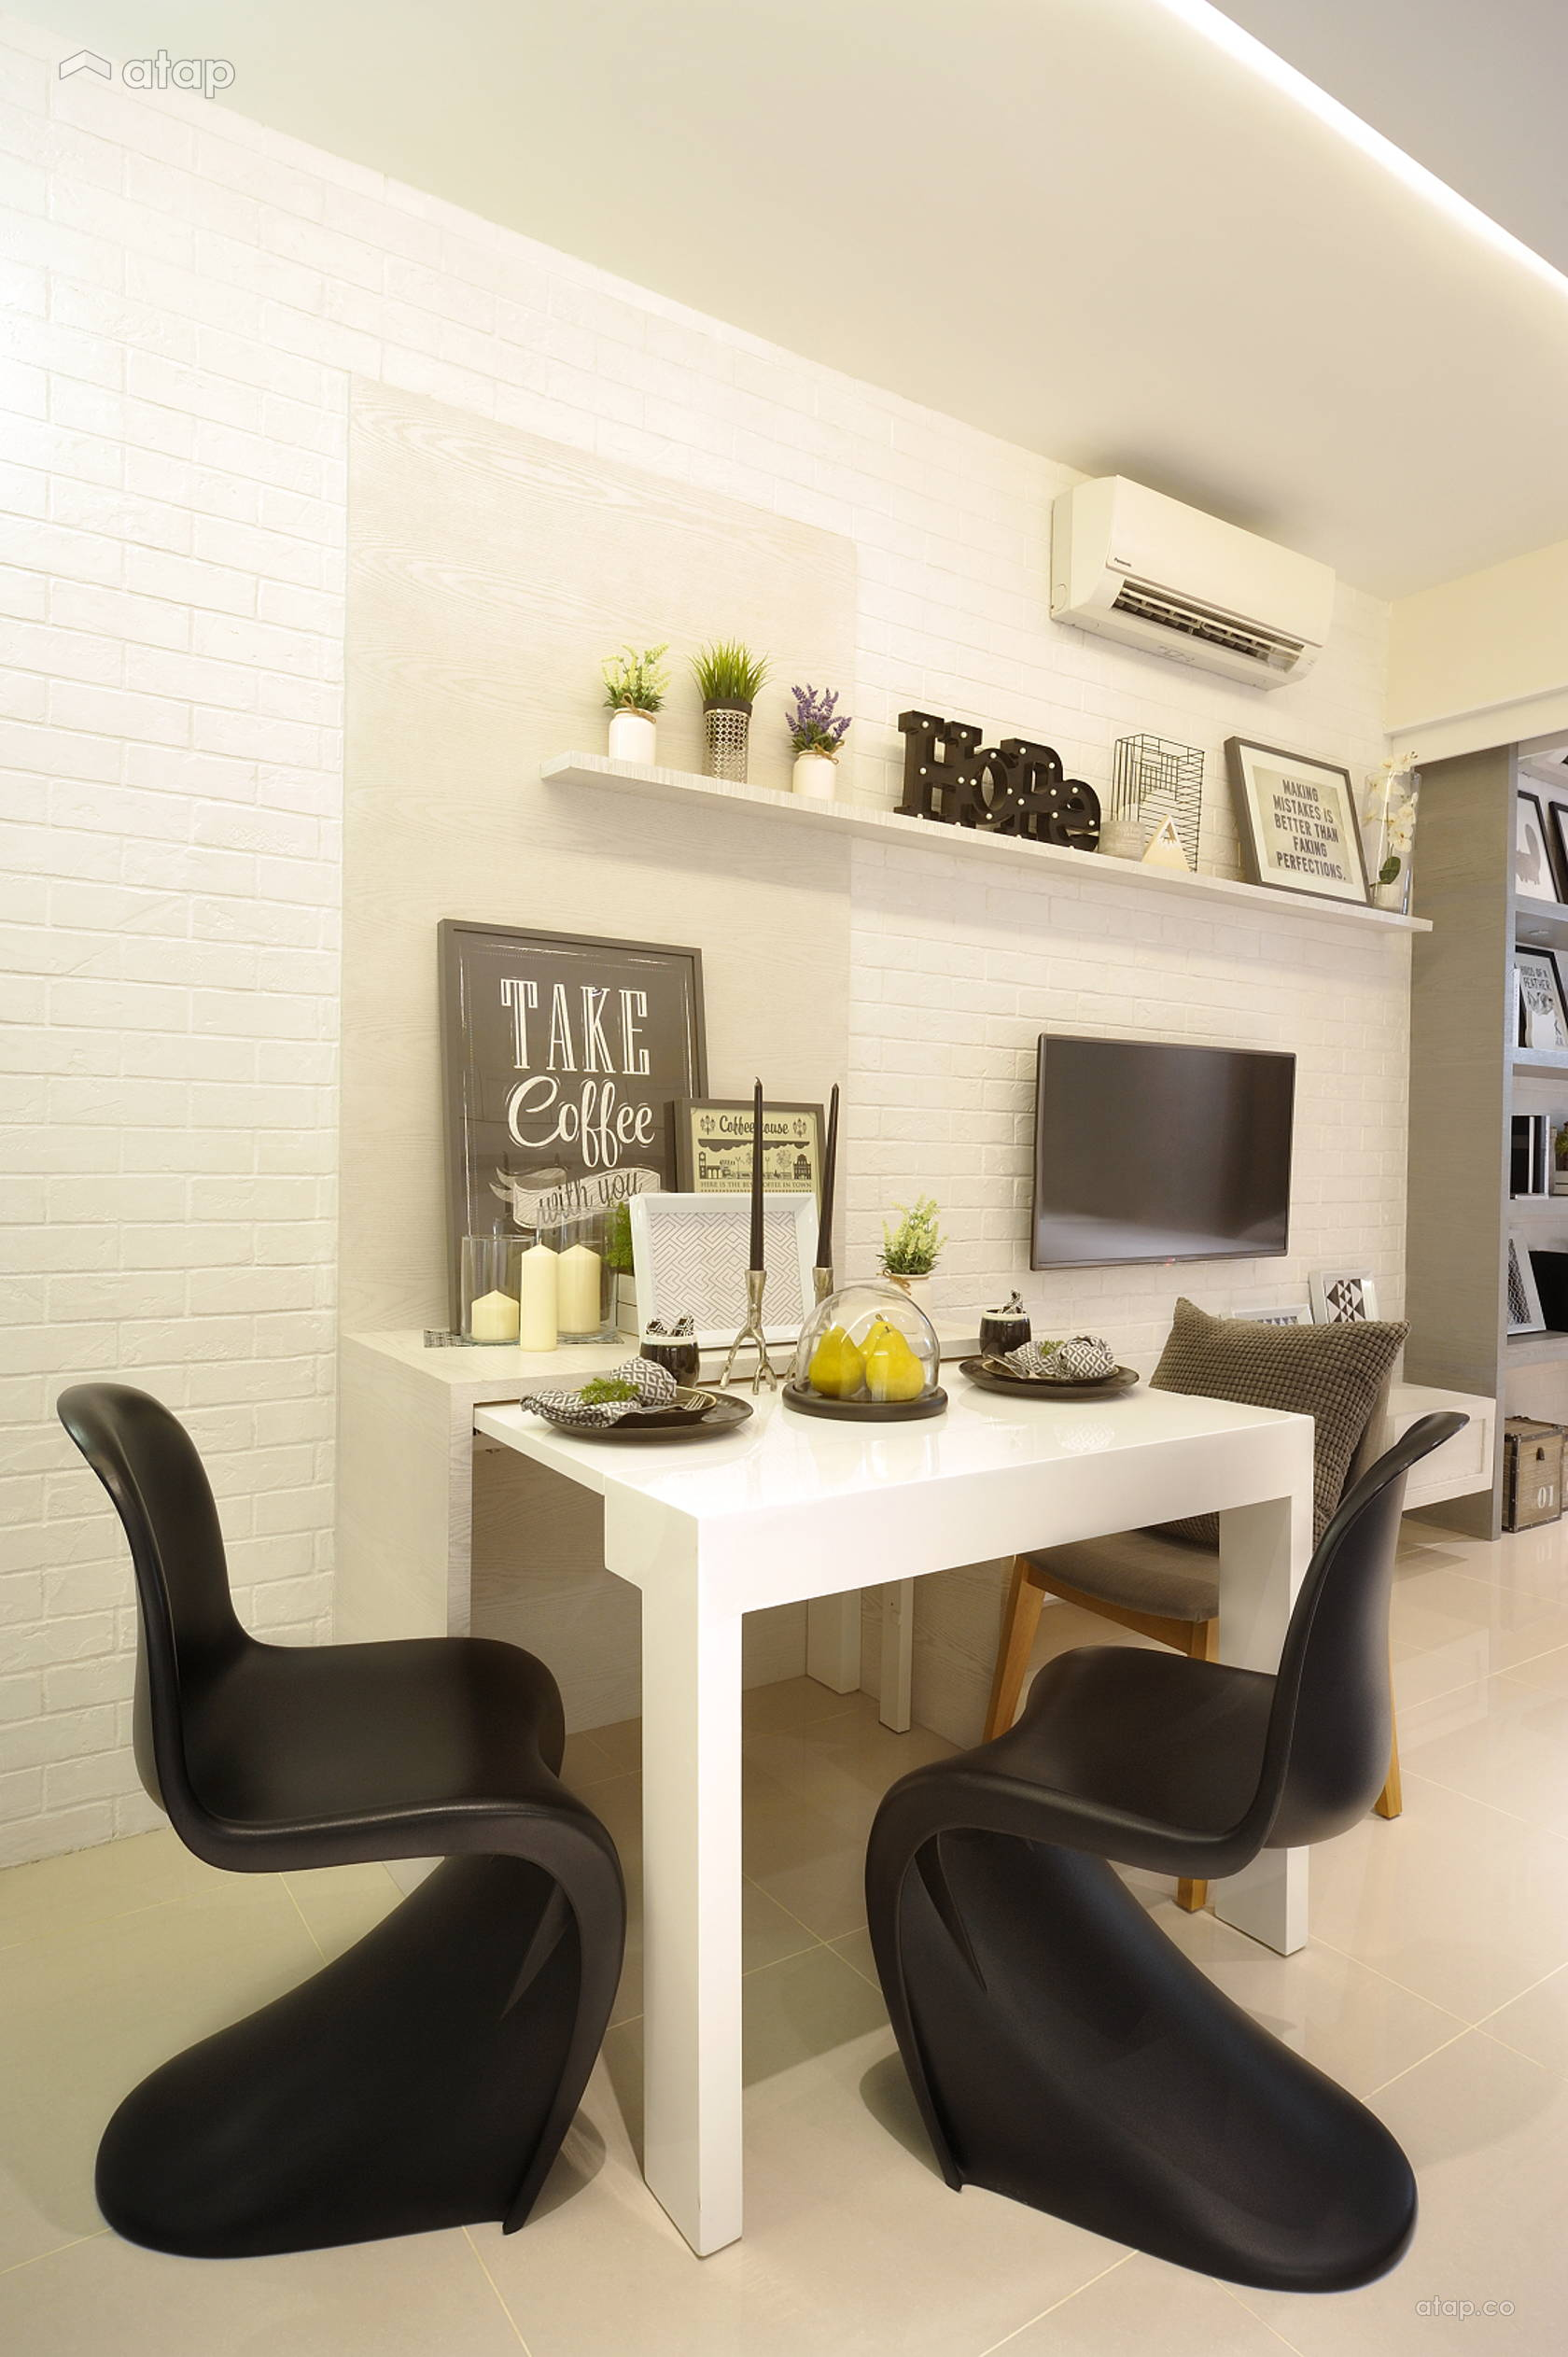 Minimalistic Modern Dining Room @ HighPark Studio A3